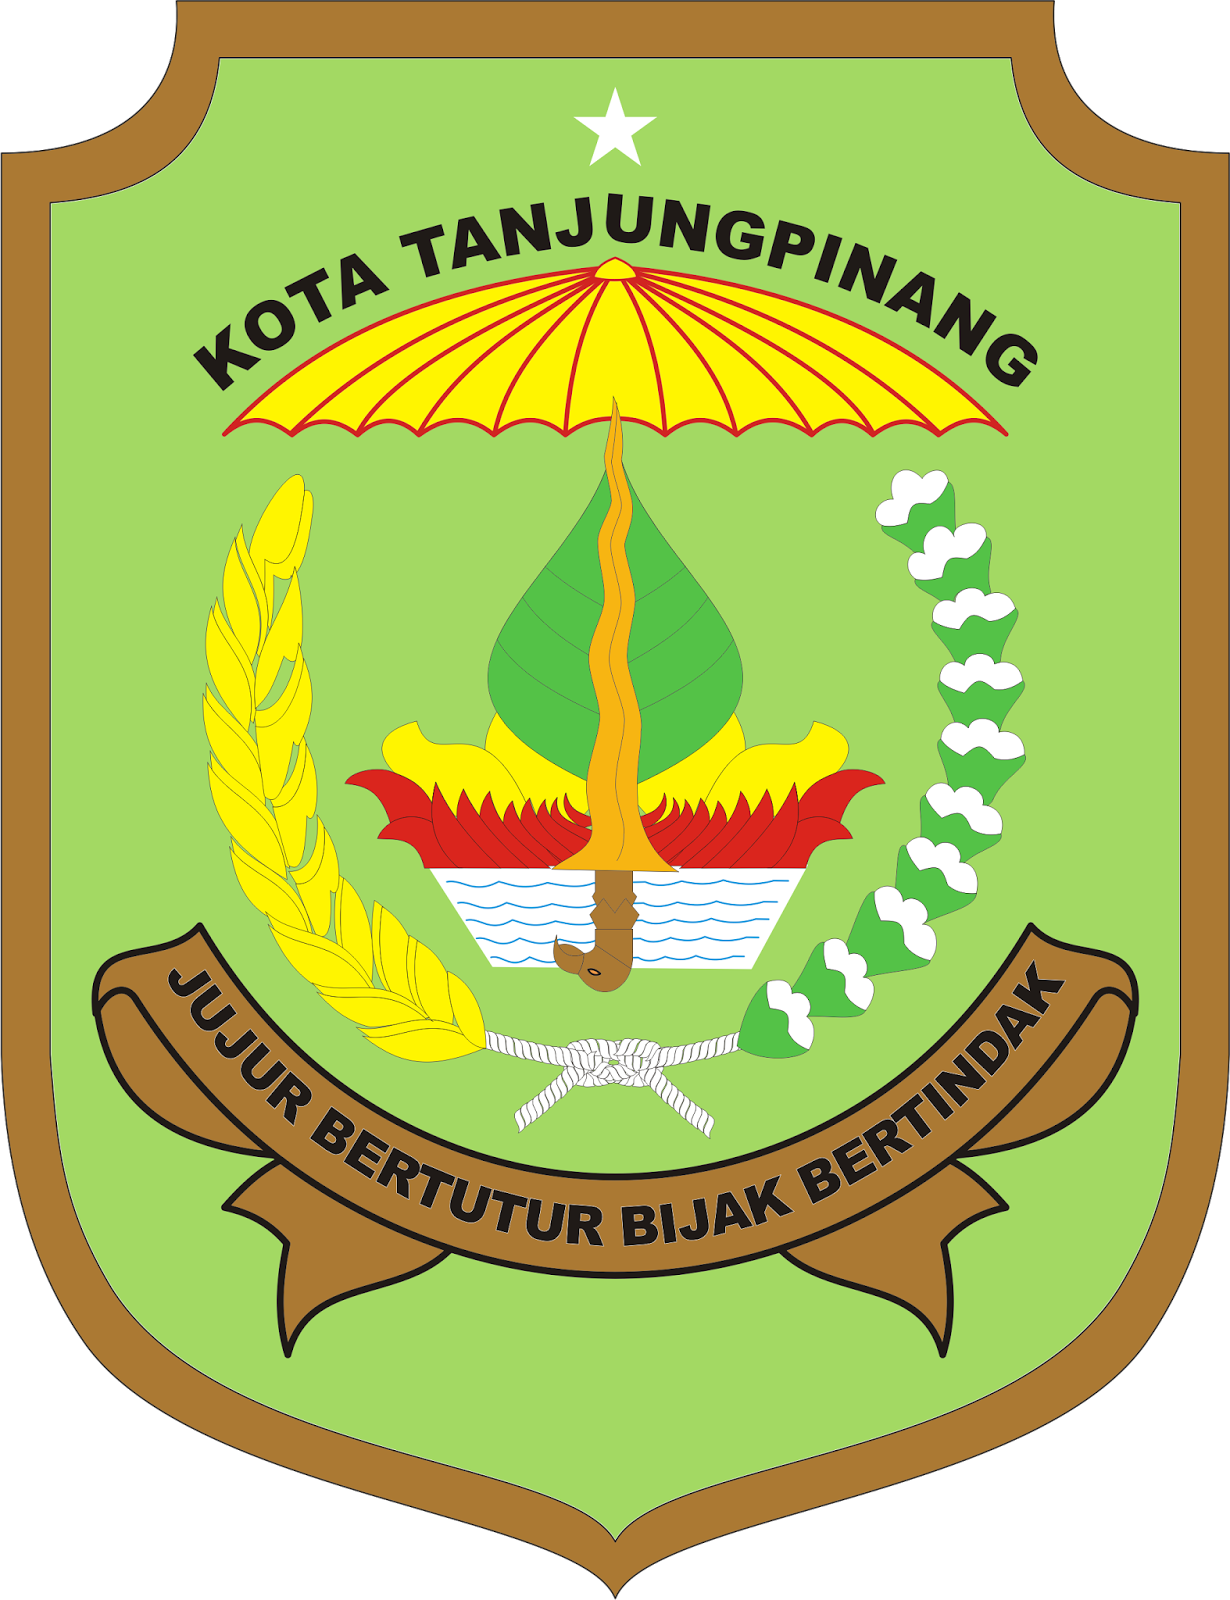 Dinas Kependudukan dan Catatan Sipil Tanjungpinang